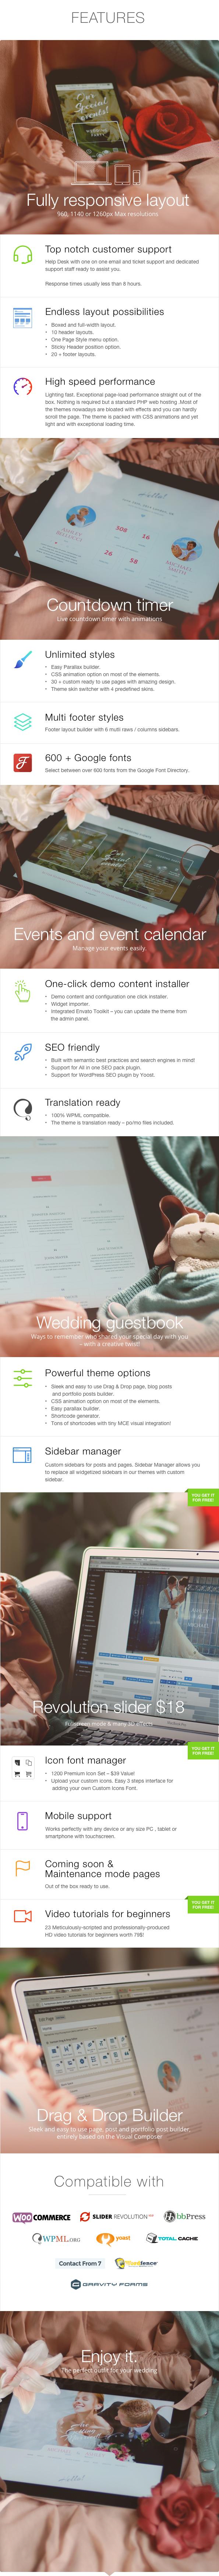 highlights  Download Honeymoon – Wedding & Wedding planner WordPress nulled Features